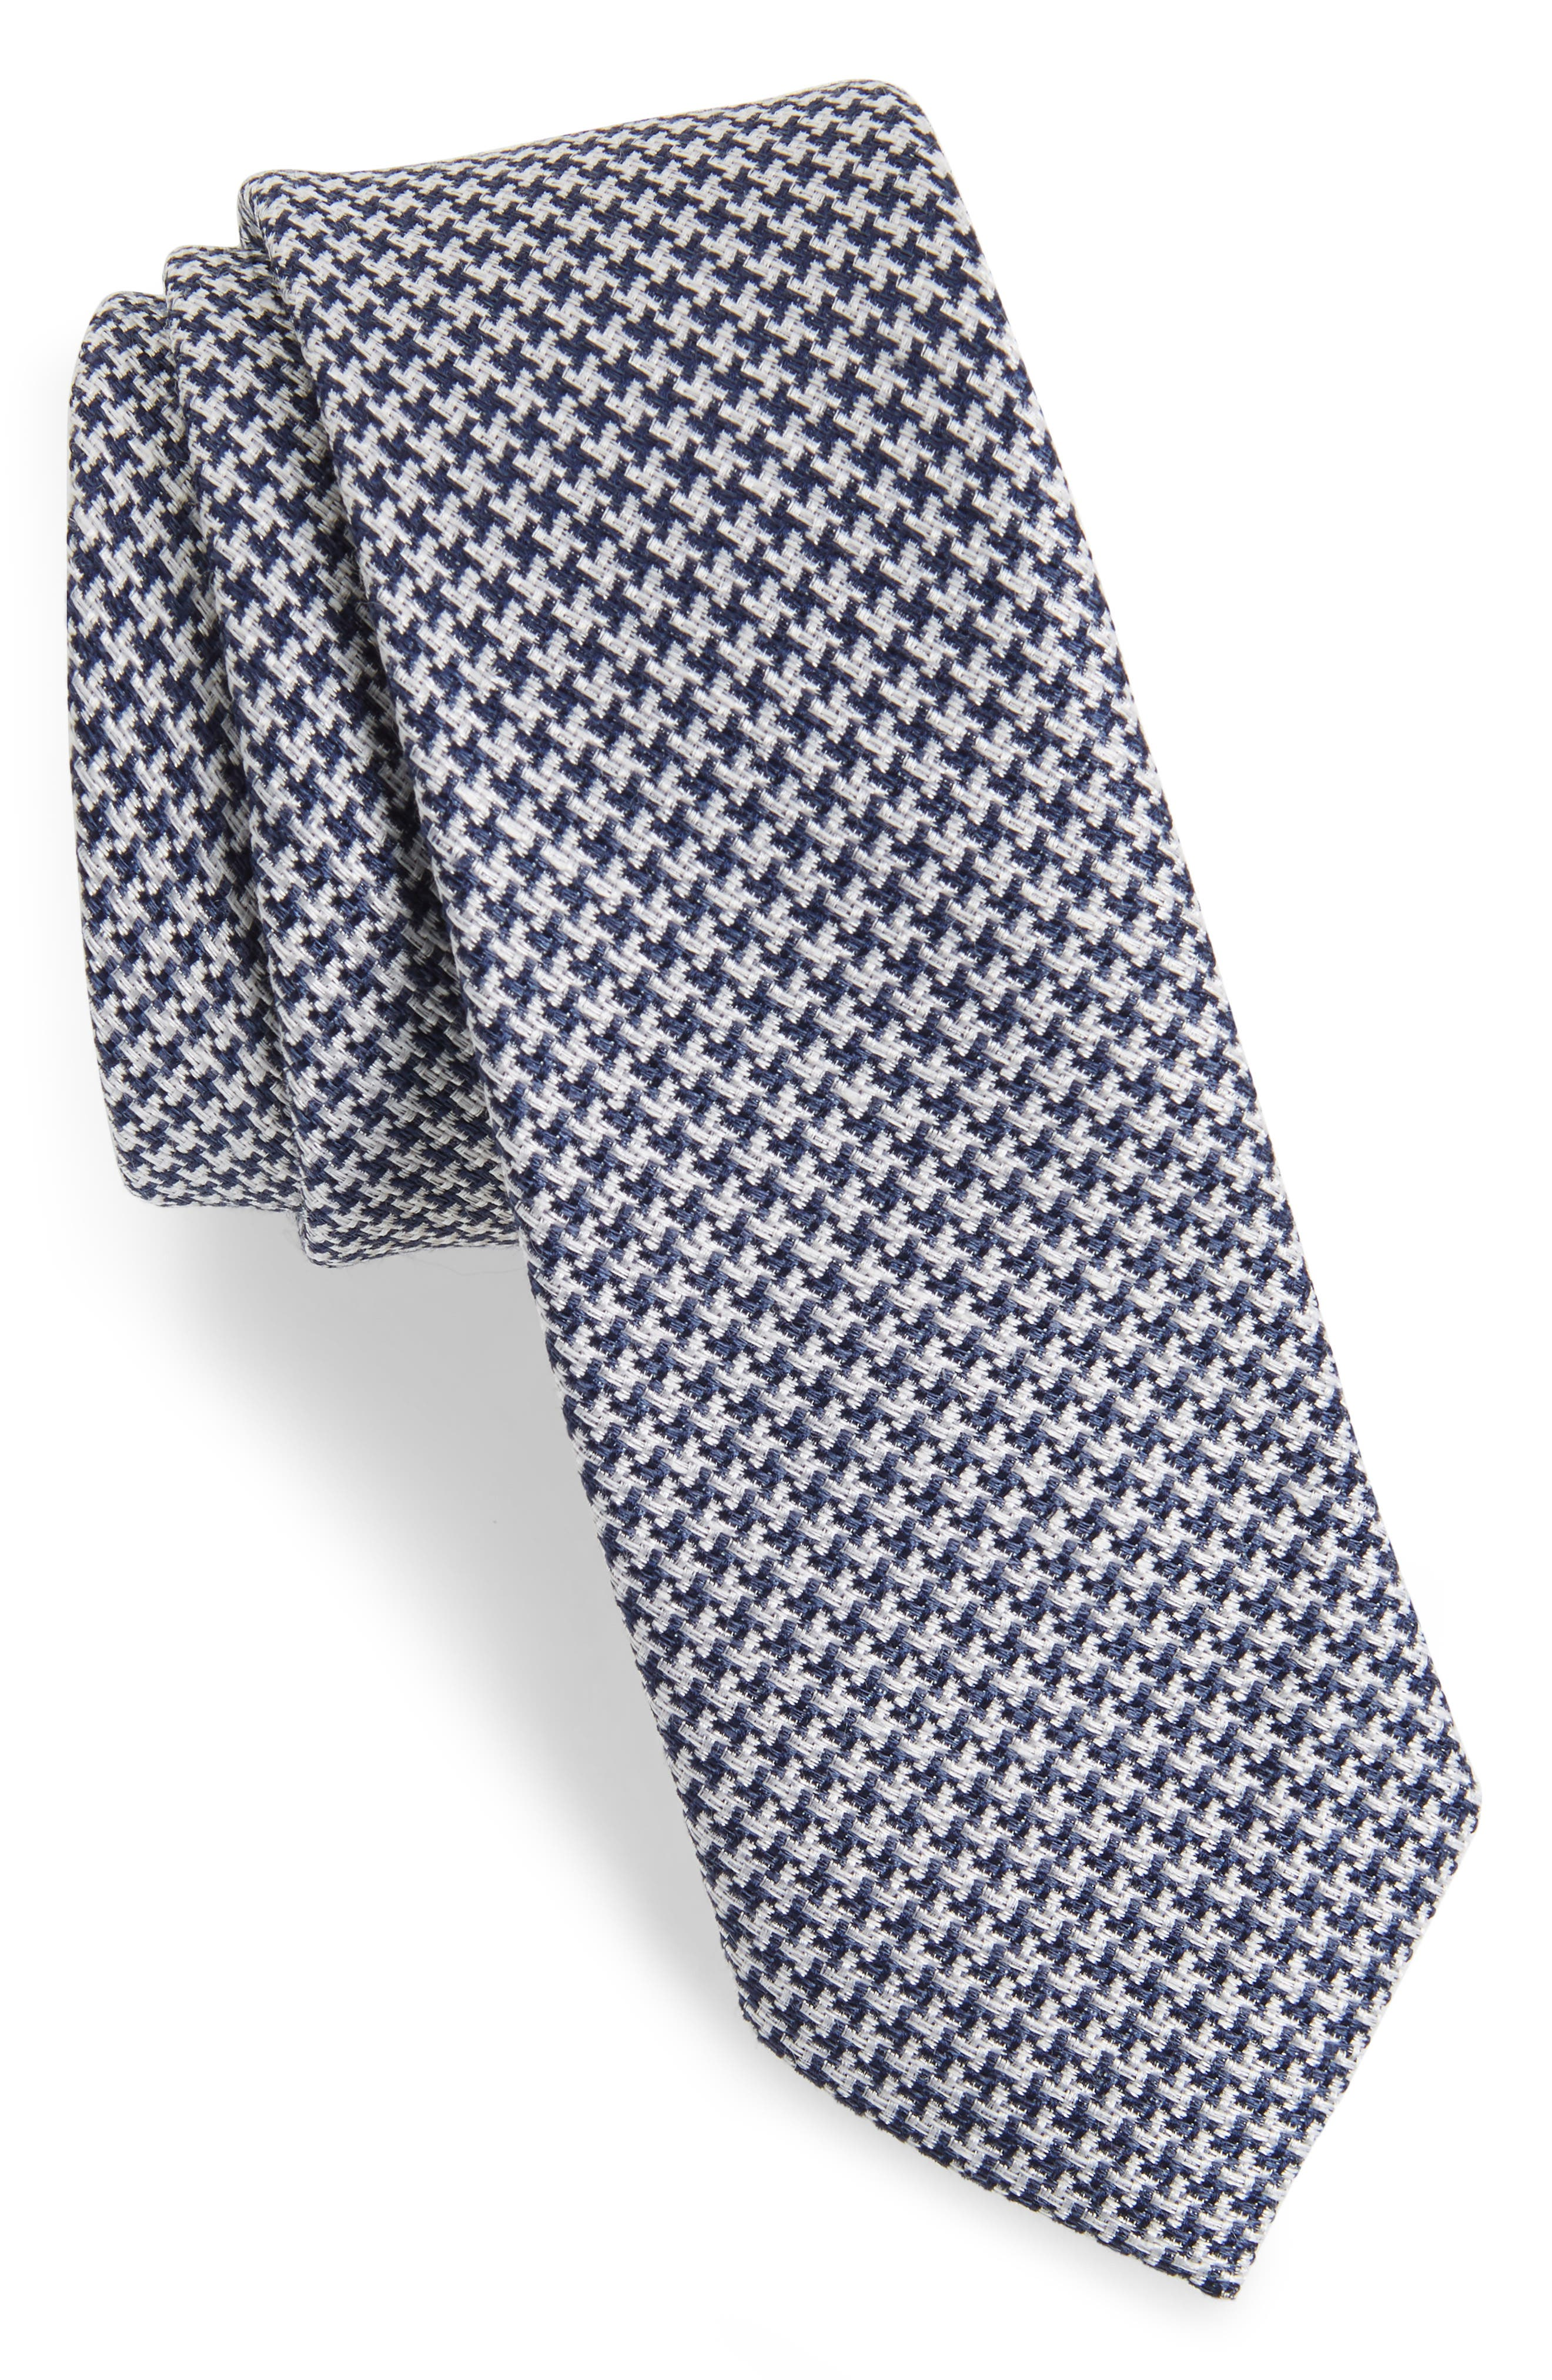 Wyden Linen & Silk Tie,                             Main thumbnail 1, color,                             410